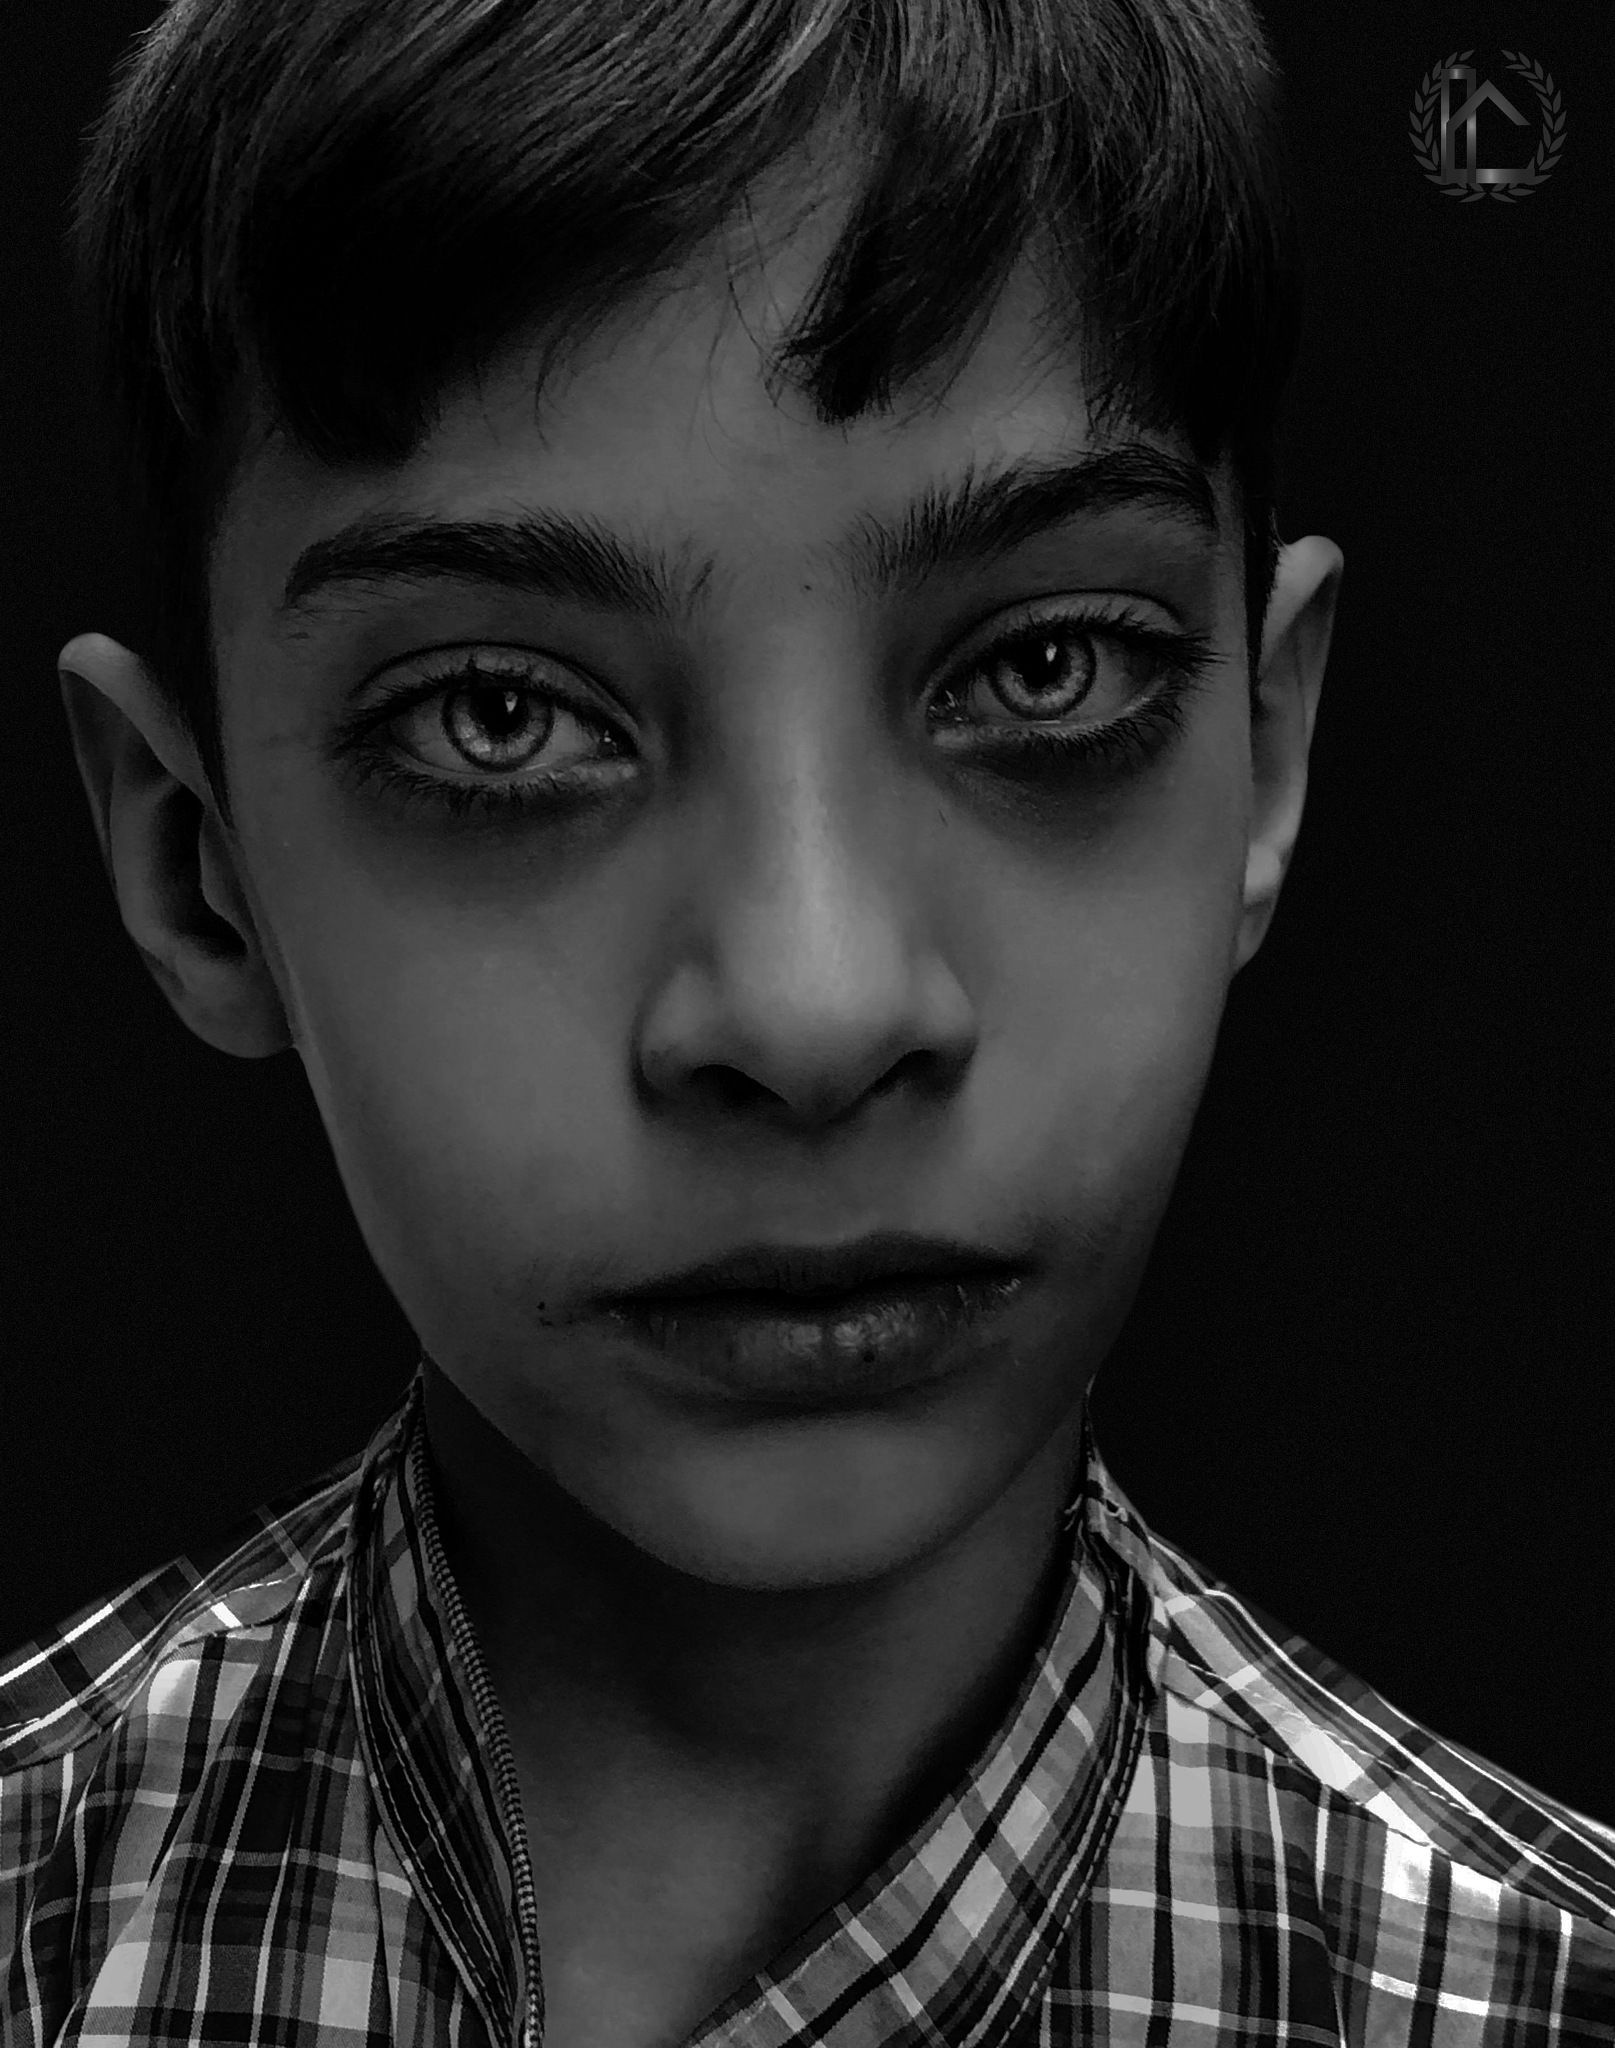 Untitled by Thasien Fatlawi